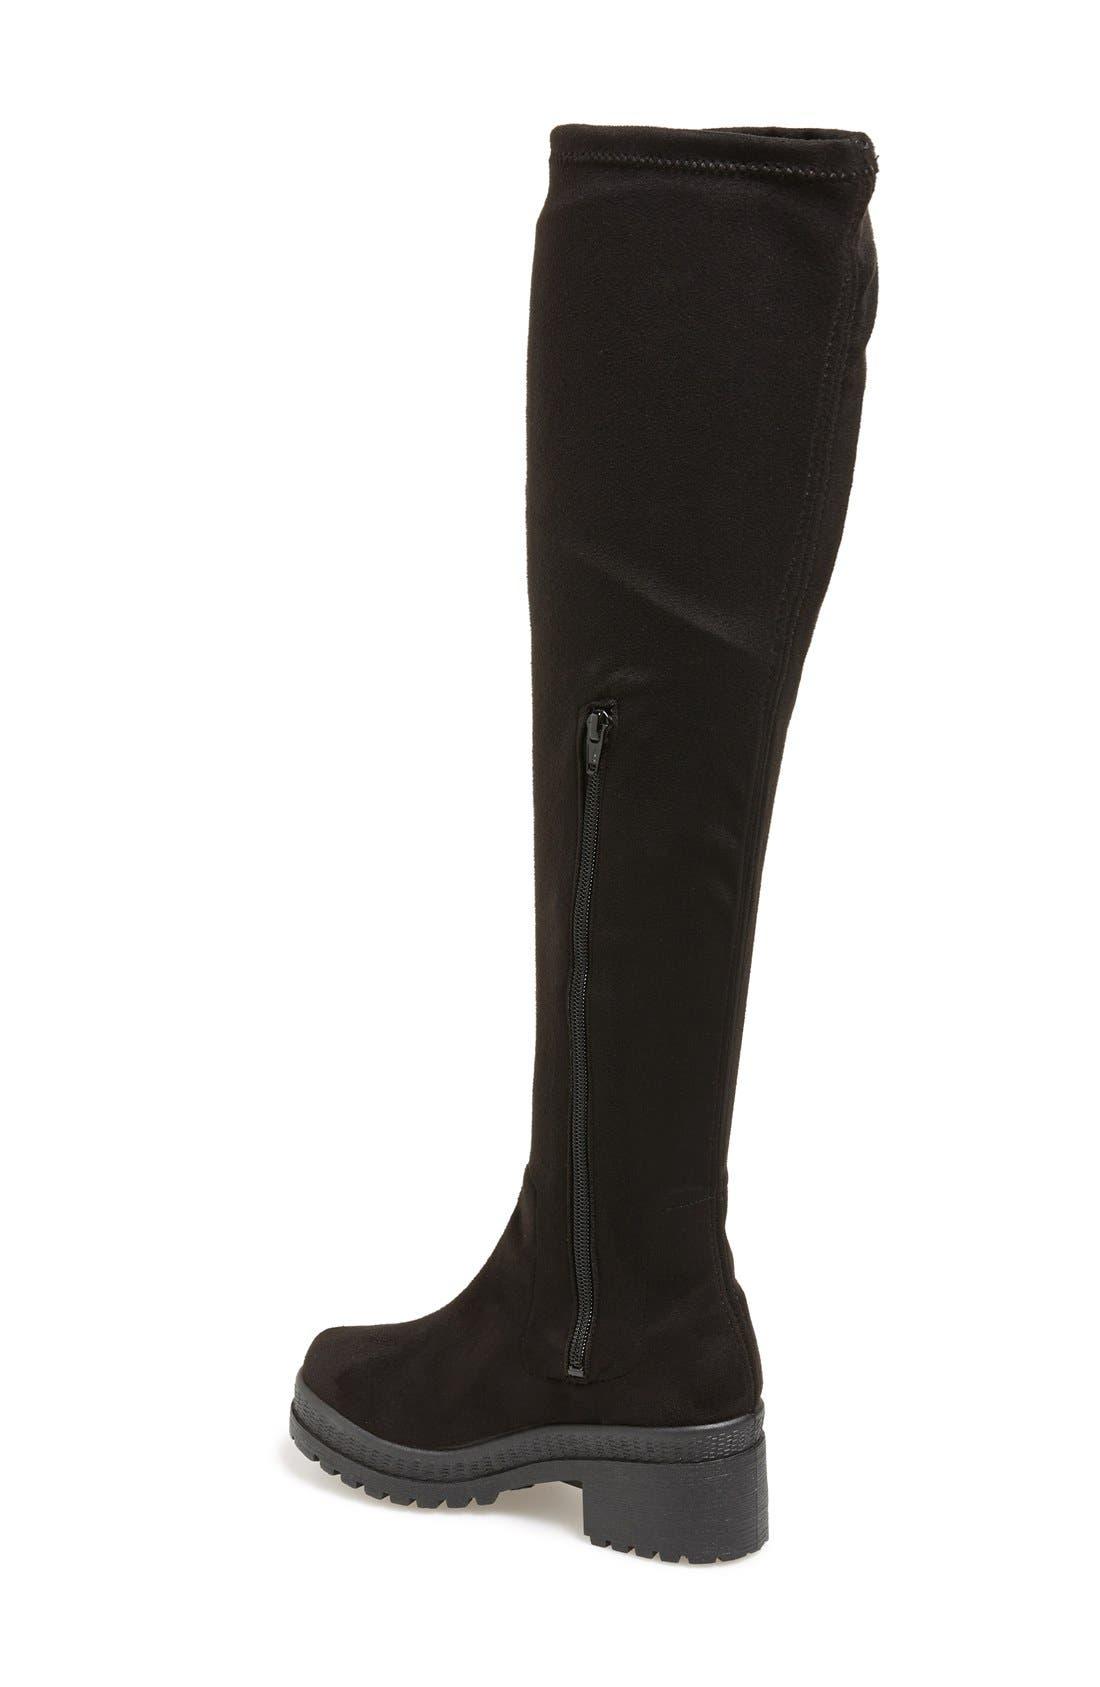 Alternate Image 2  - Topshop'Danger' Over the Knee Boot (Women)